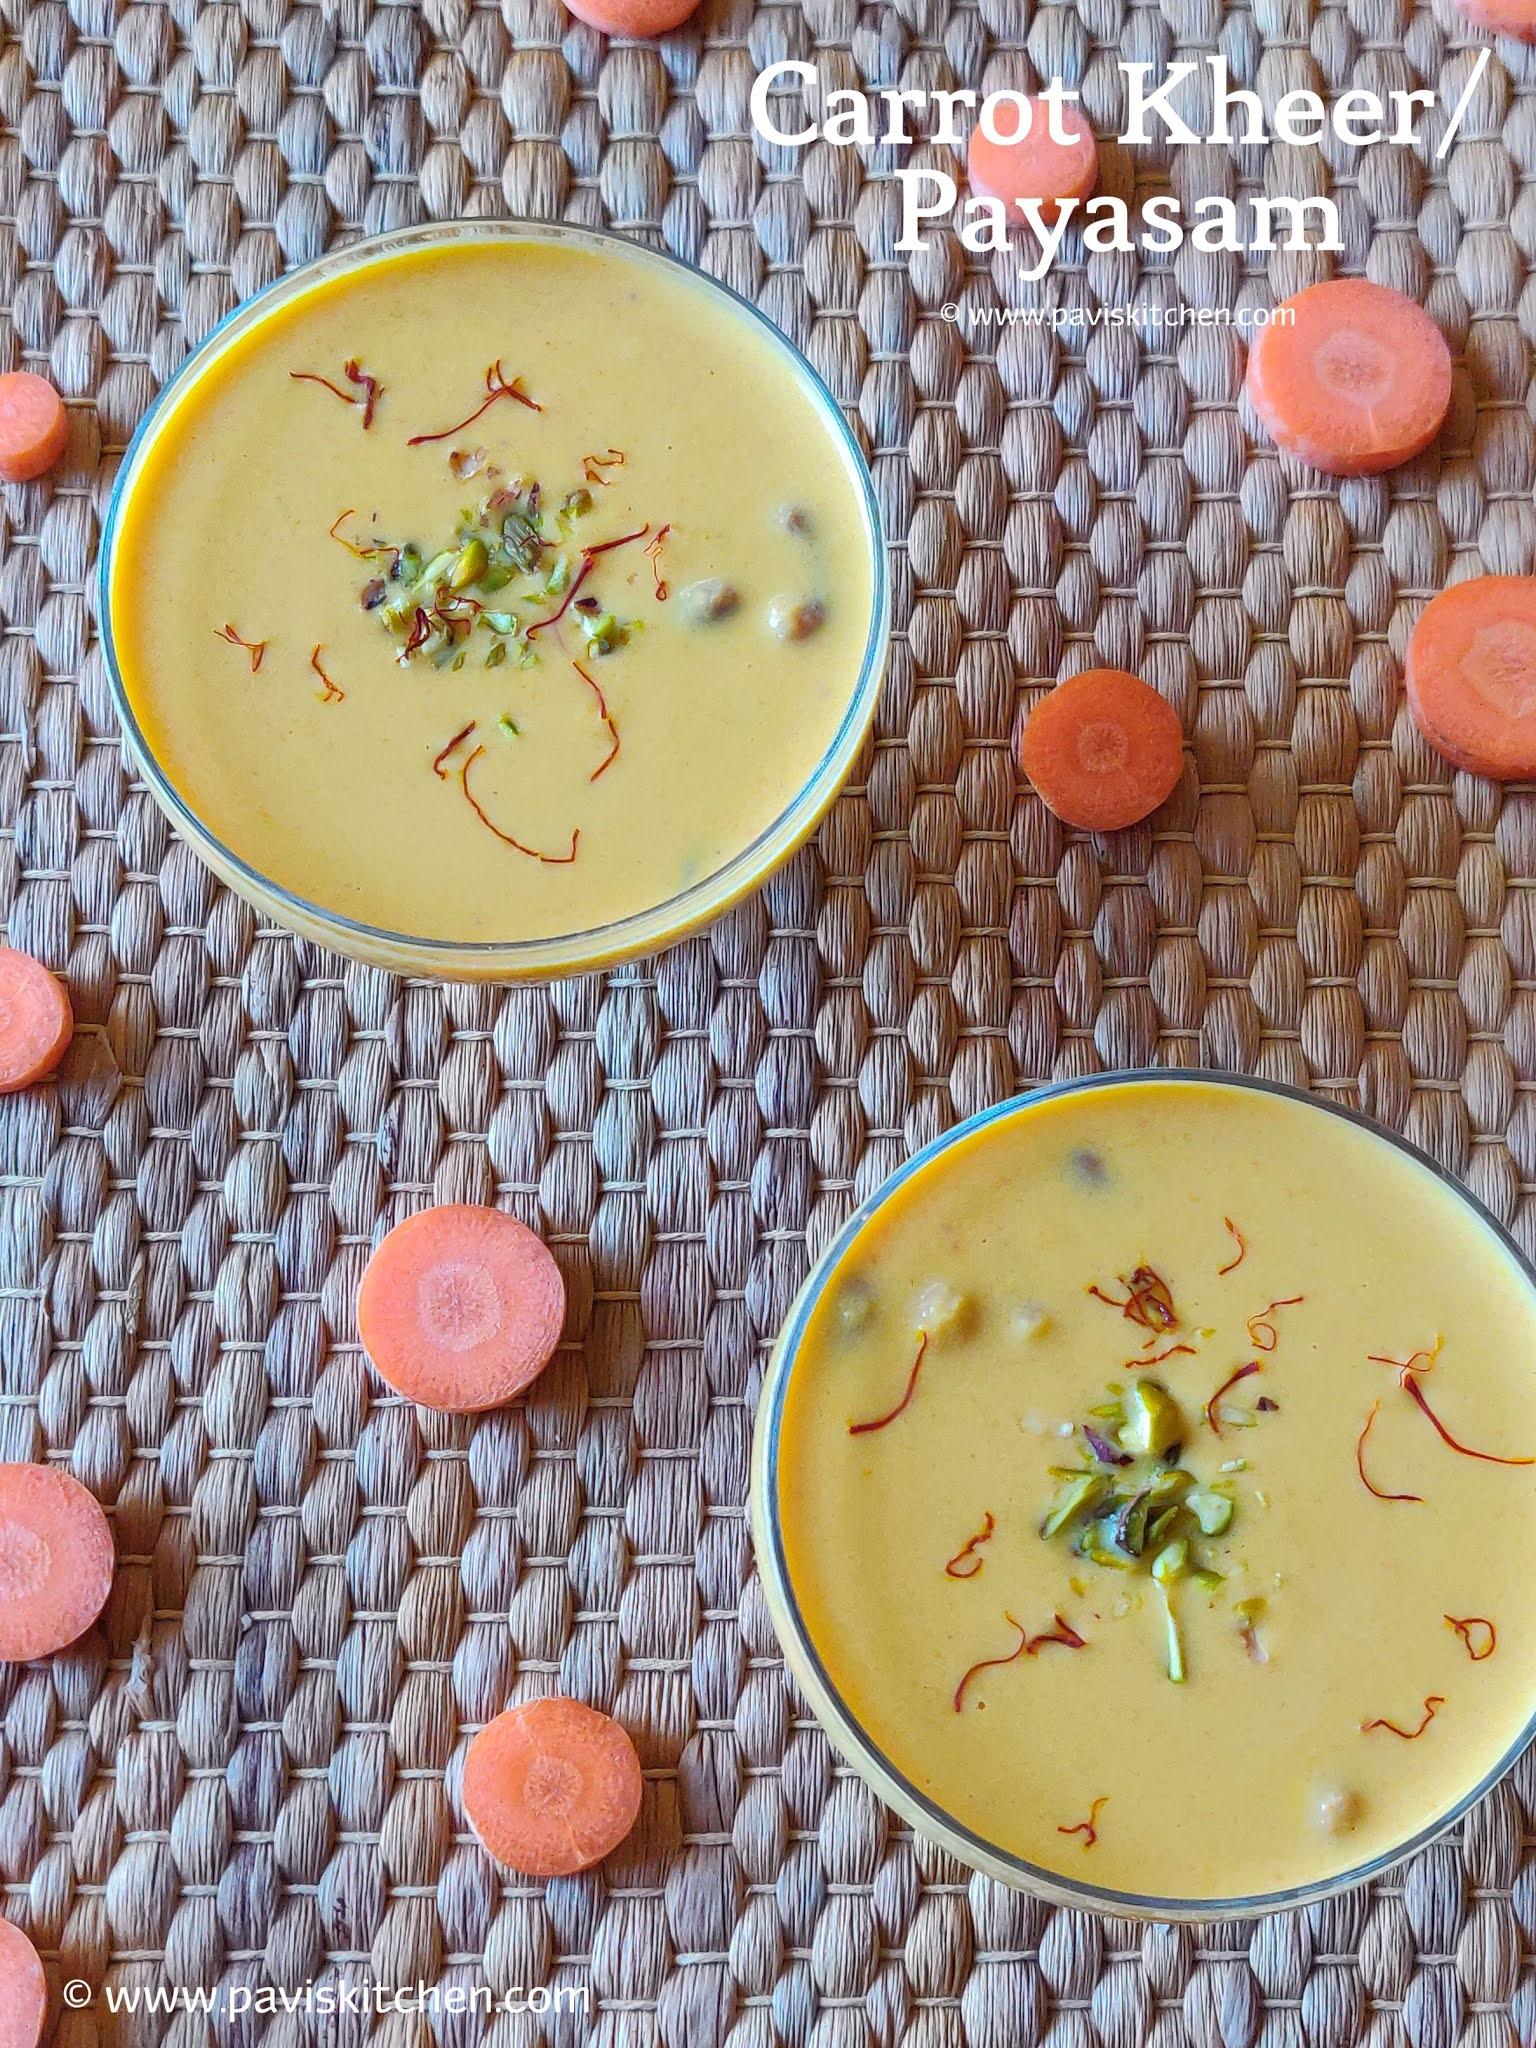 Carrot kheer recipe | Carrot payasam recipe | Indian carrot dessert recipe